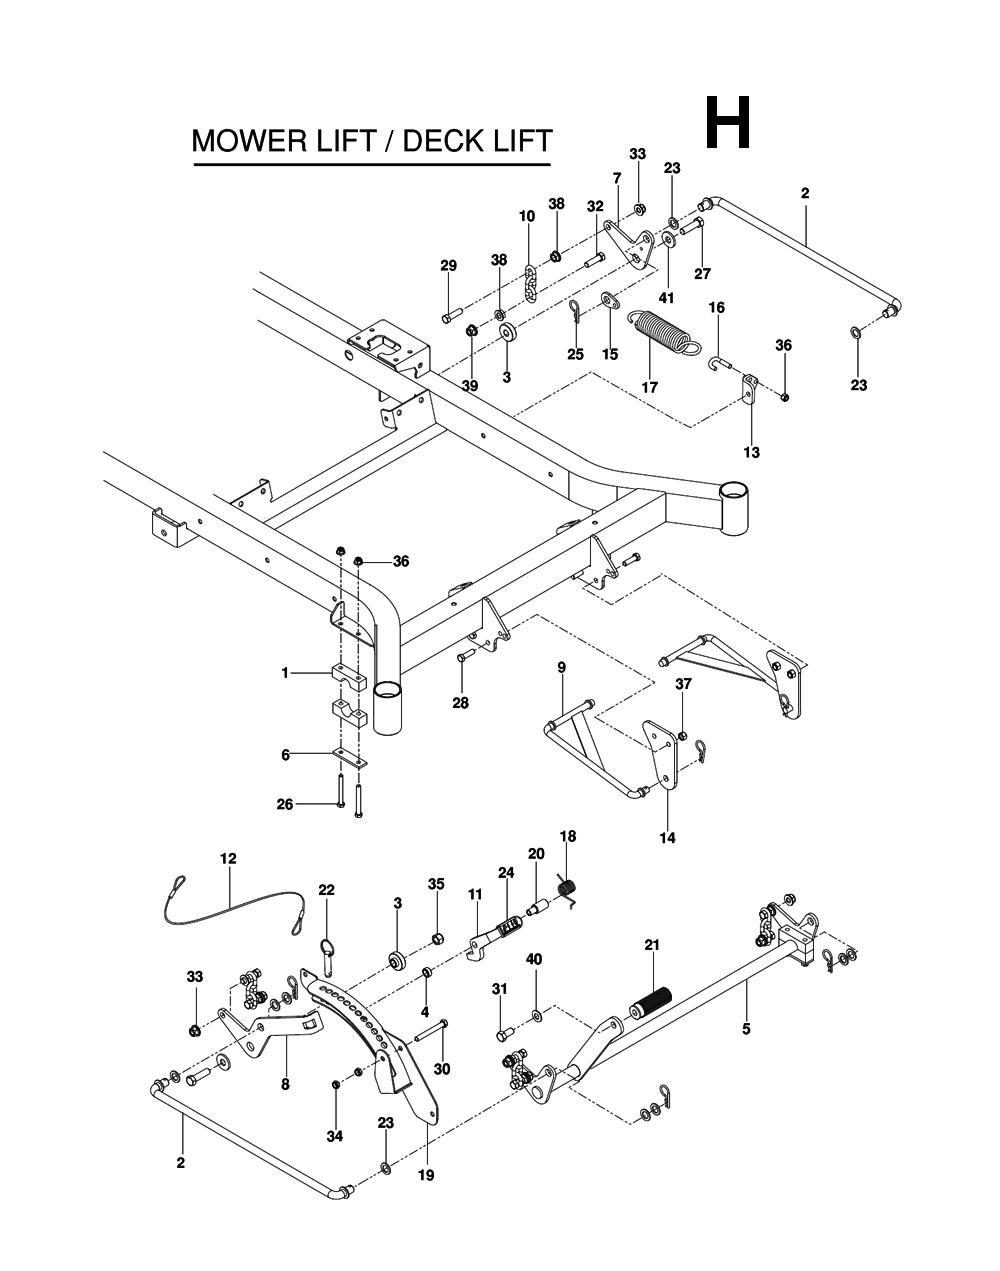 Husqvarna Wiring Diagram Mz52le Free Download • Playapk.co on norton wiring diagram, husky riding mower parts diagram, ossa wiring diagram, husqvarna honda, ajs wiring diagram, beta wiring diagram, sears wiring diagram, polaris wiring diagram, ayp wiring diagram, kubota wiring diagram, yamaha wiring diagram, echo wiring diagram, riding lawn mower wiring diagram, arctic cat wiring diagram, husqvarna mower schematics, simplicity wiring diagram, cub cadet wiring diagram, electrolux wiring diagram, scotts wiring diagram, bajaj wiring diagram,